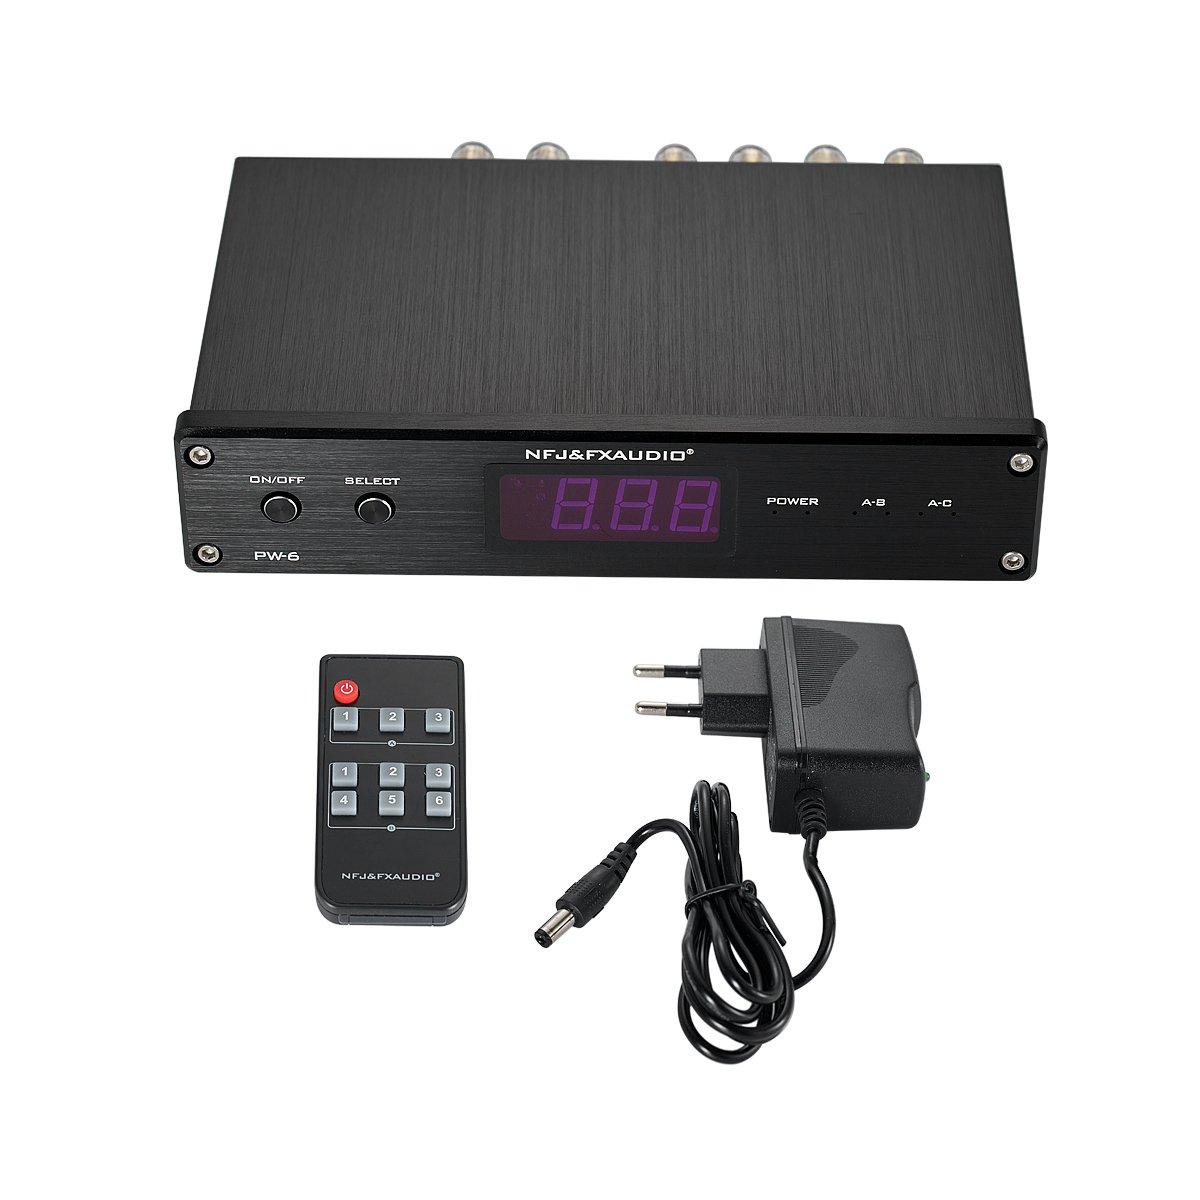 Nobsound Hi-Fi 2-Way Audio Crossover Speakers//Amplifiers Switcher Splitter Selector with Remote Control /& LED Display /& Power Supply Verst/ärker Verteiler Umschalter Splitter